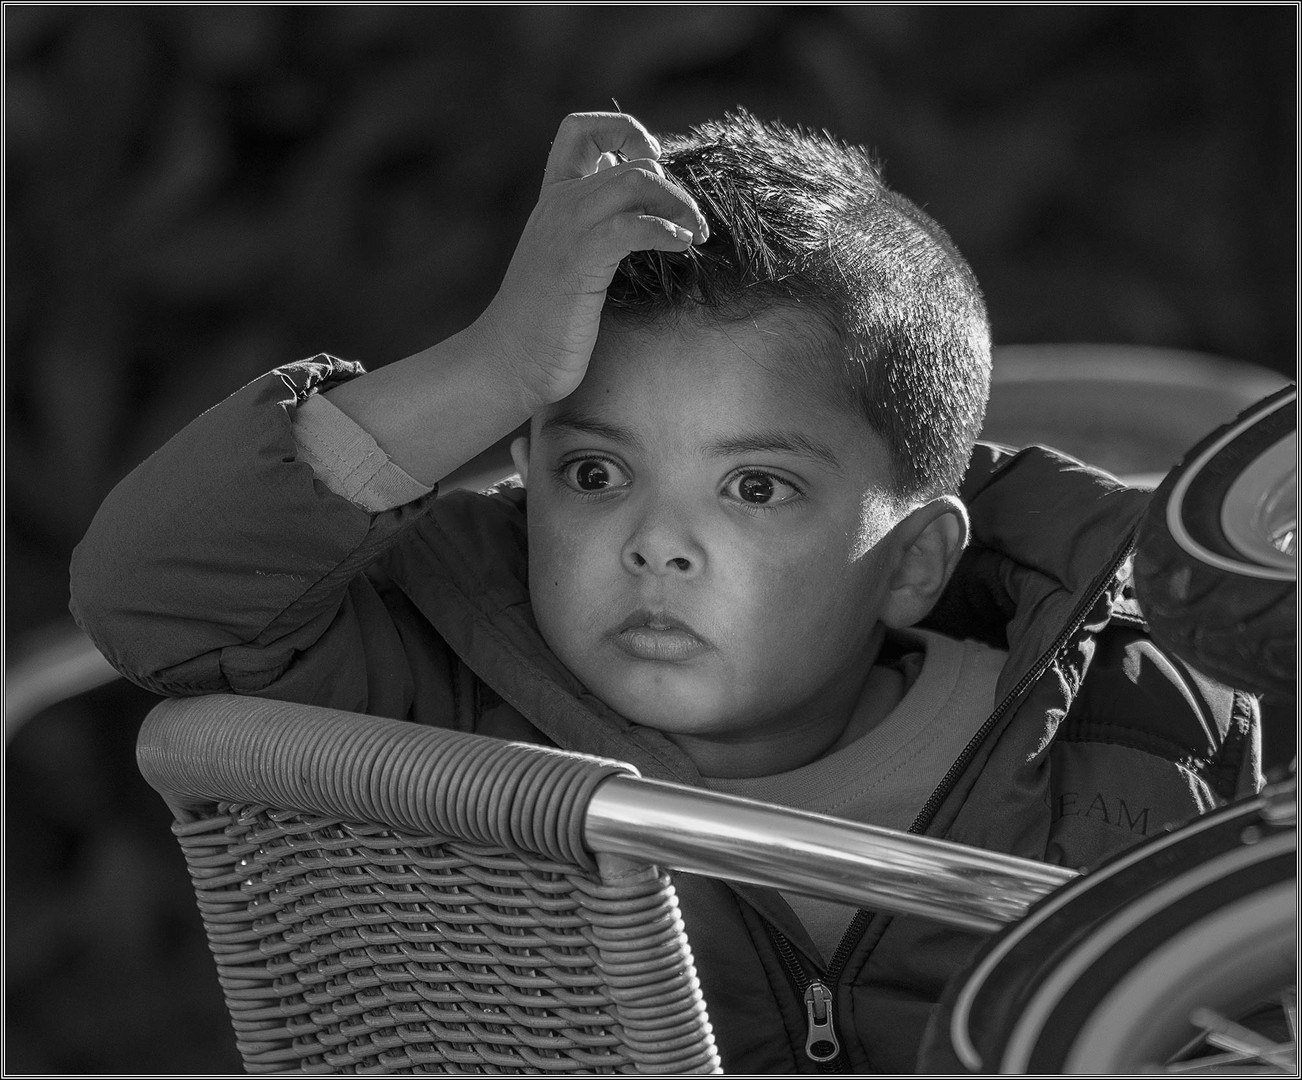 A Thinker